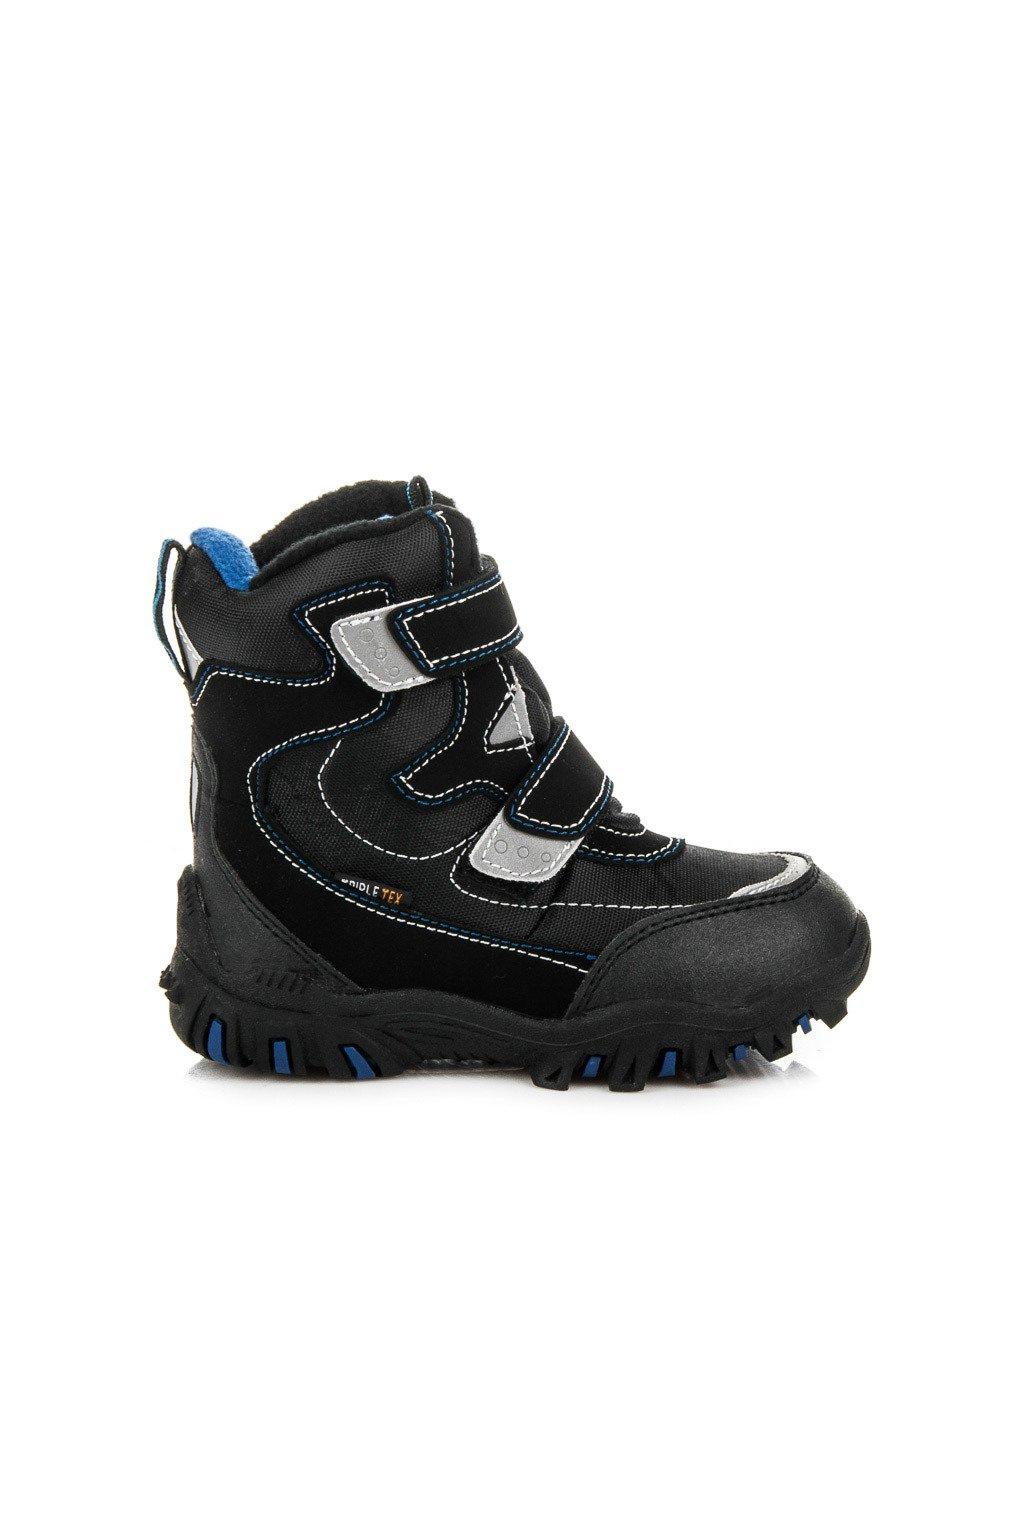 5c996d1da0b3 Výpredaj Detská obuv za najlepšie ceny na Svk Cz - NAJ.SK